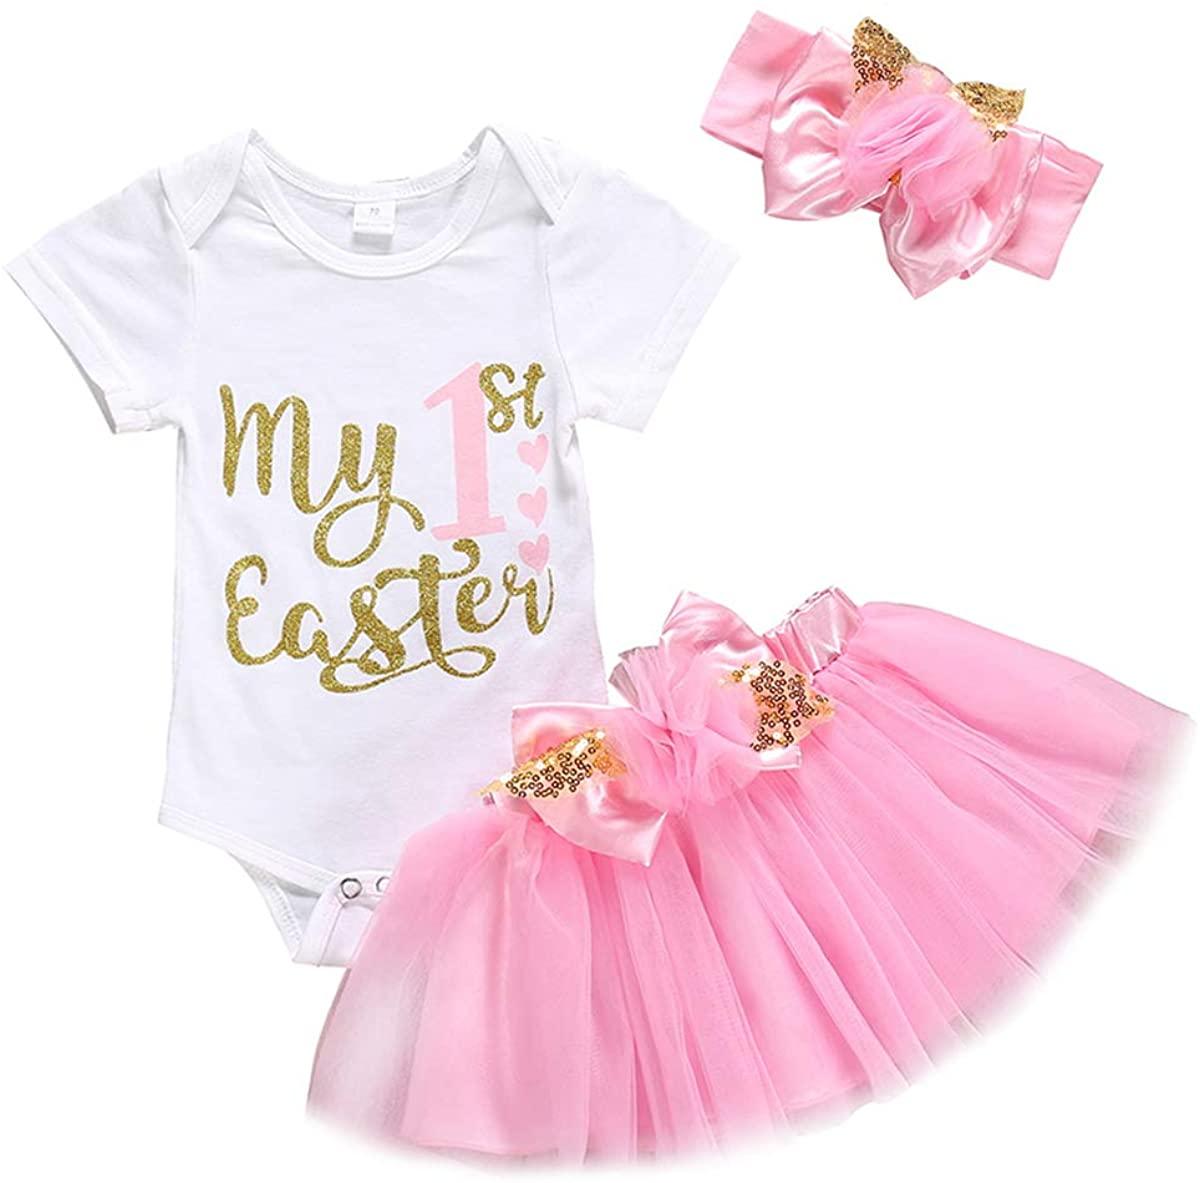 My 1st Easter Toddler Baby Girls Skirt Set Short Sleeve Romper + Tutu Dress with Headband Rabbit Outfit